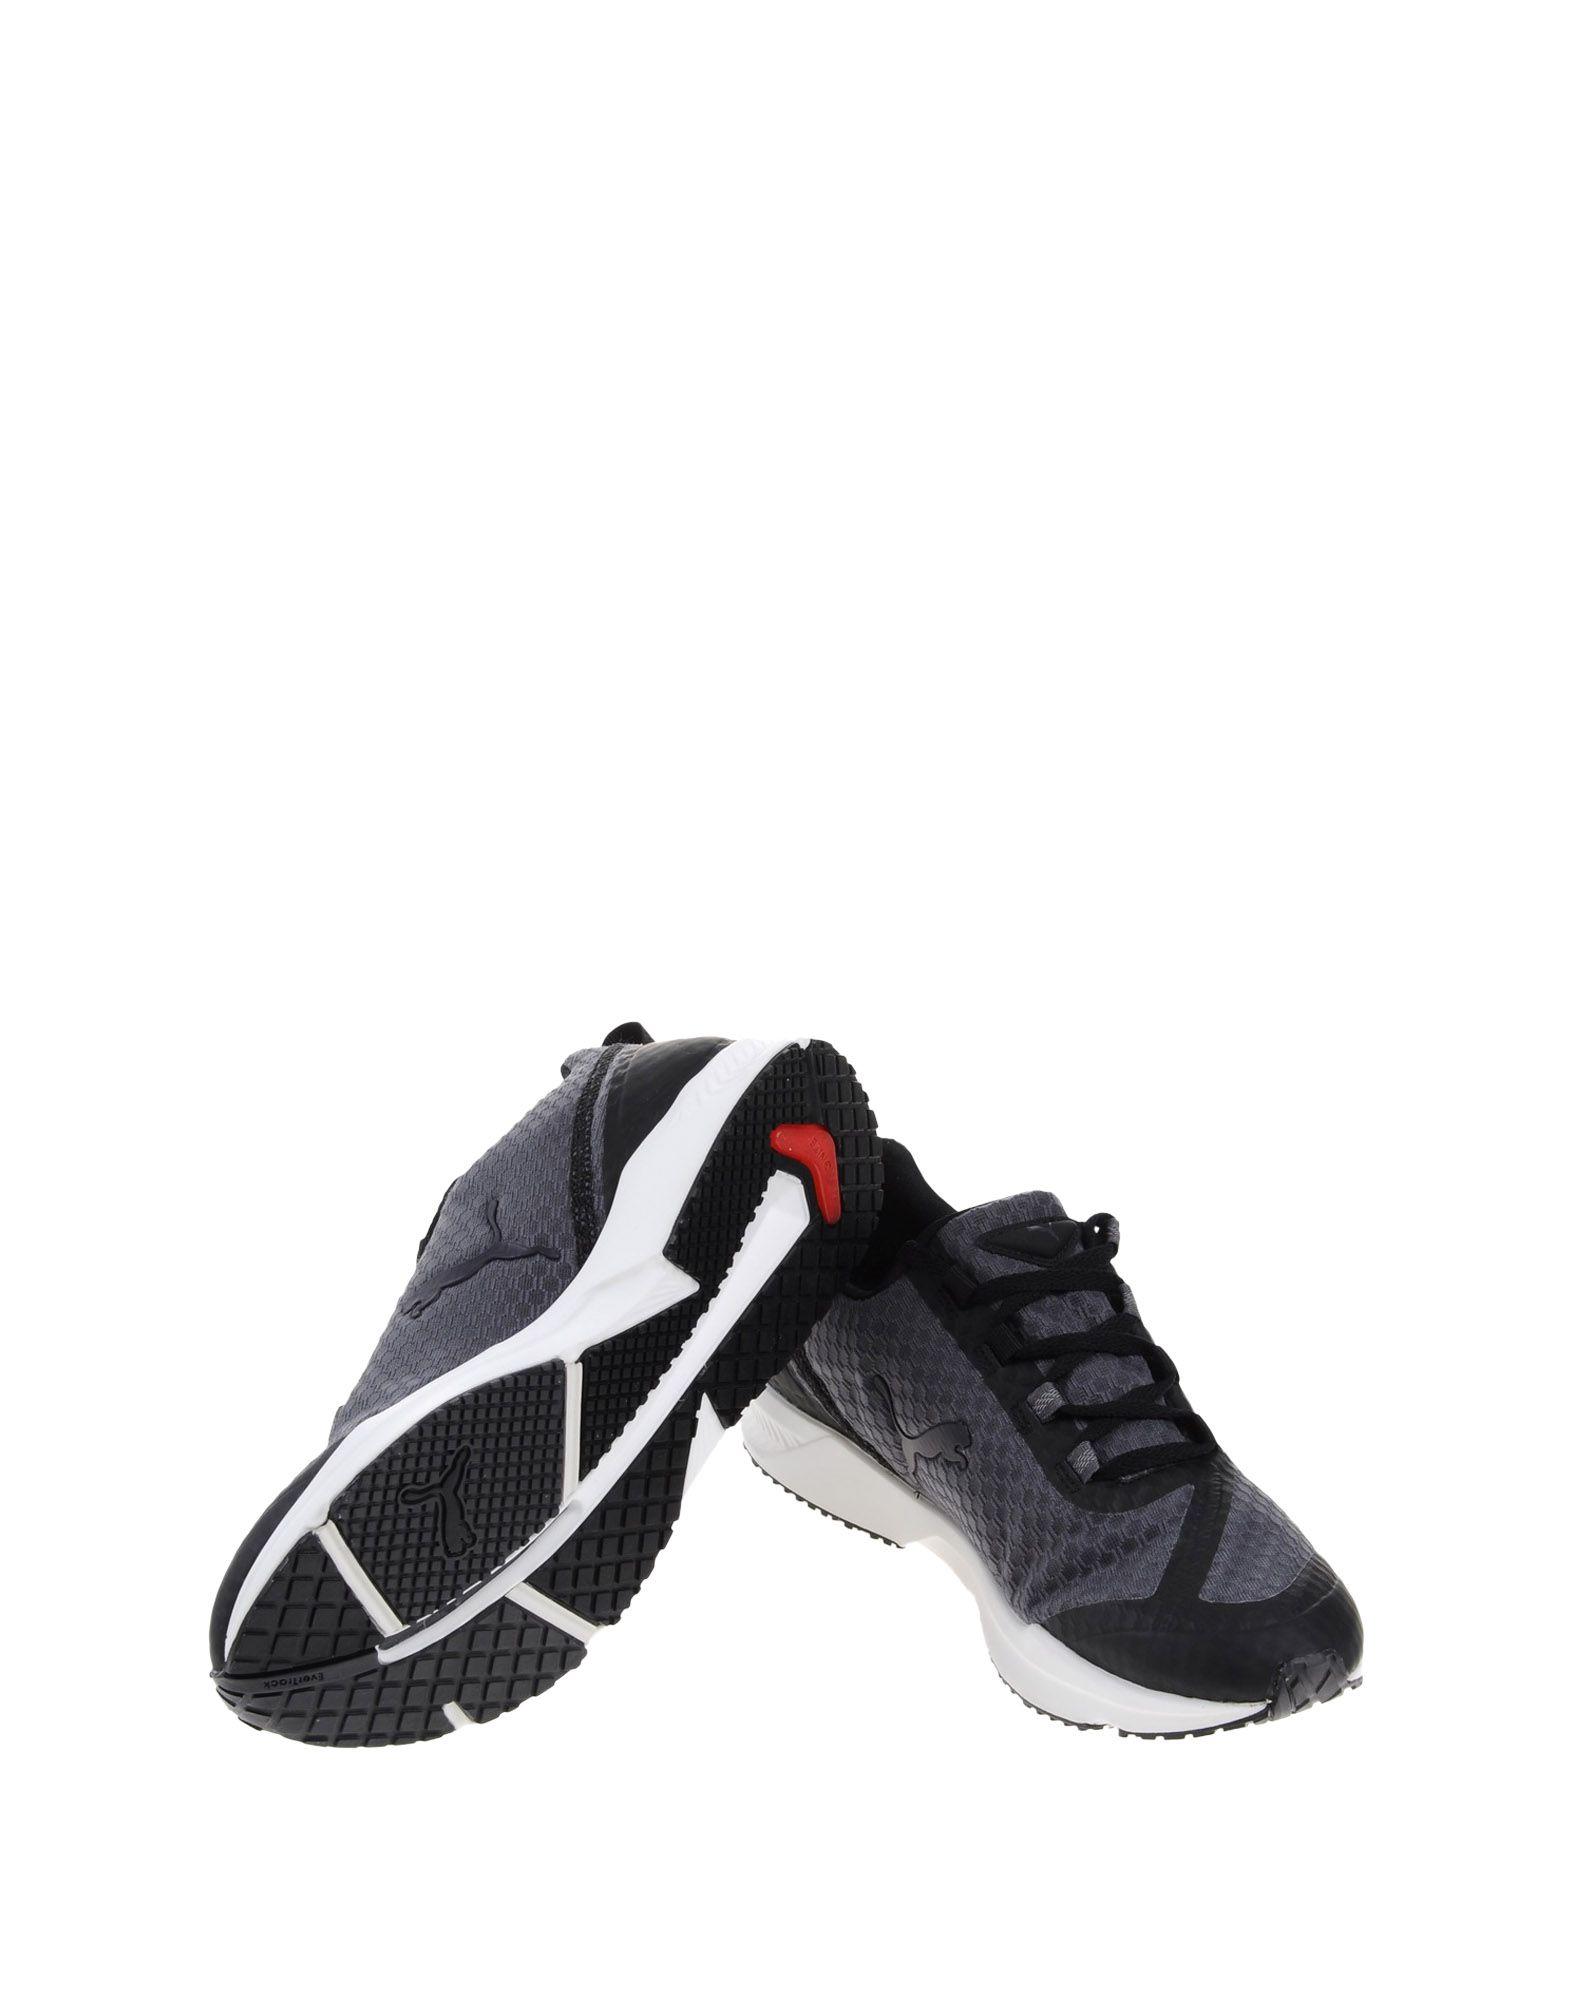 Sneakers Puma 188571-Ignite Xt Core Wns - Femme - Sneakers Puma sur